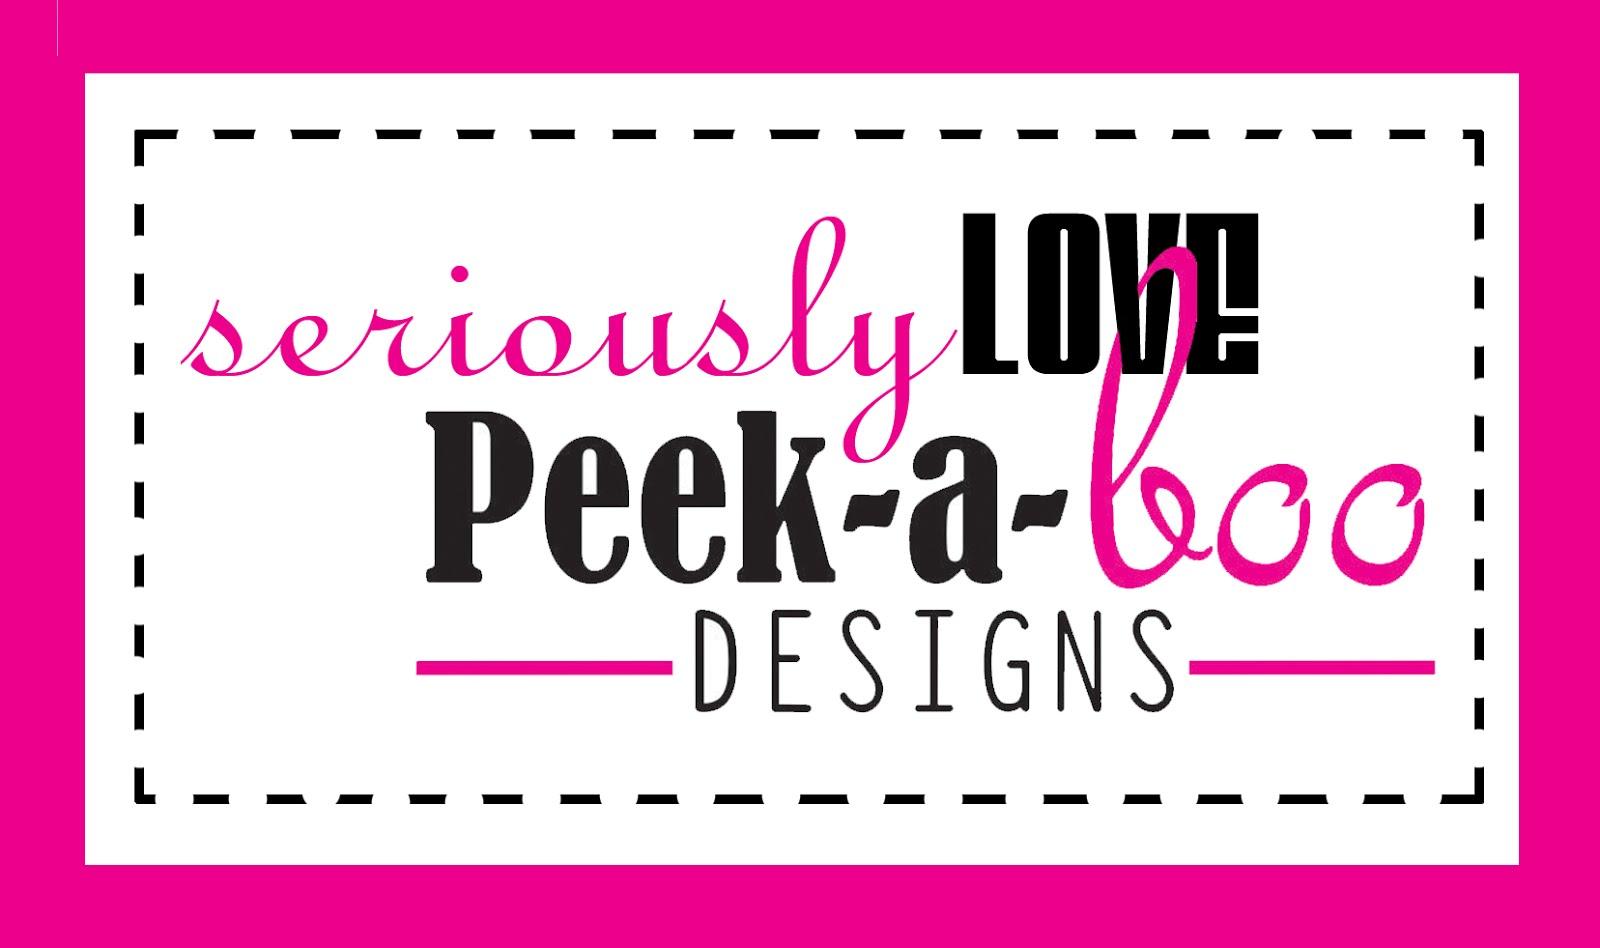 Peek-a-boo Designs